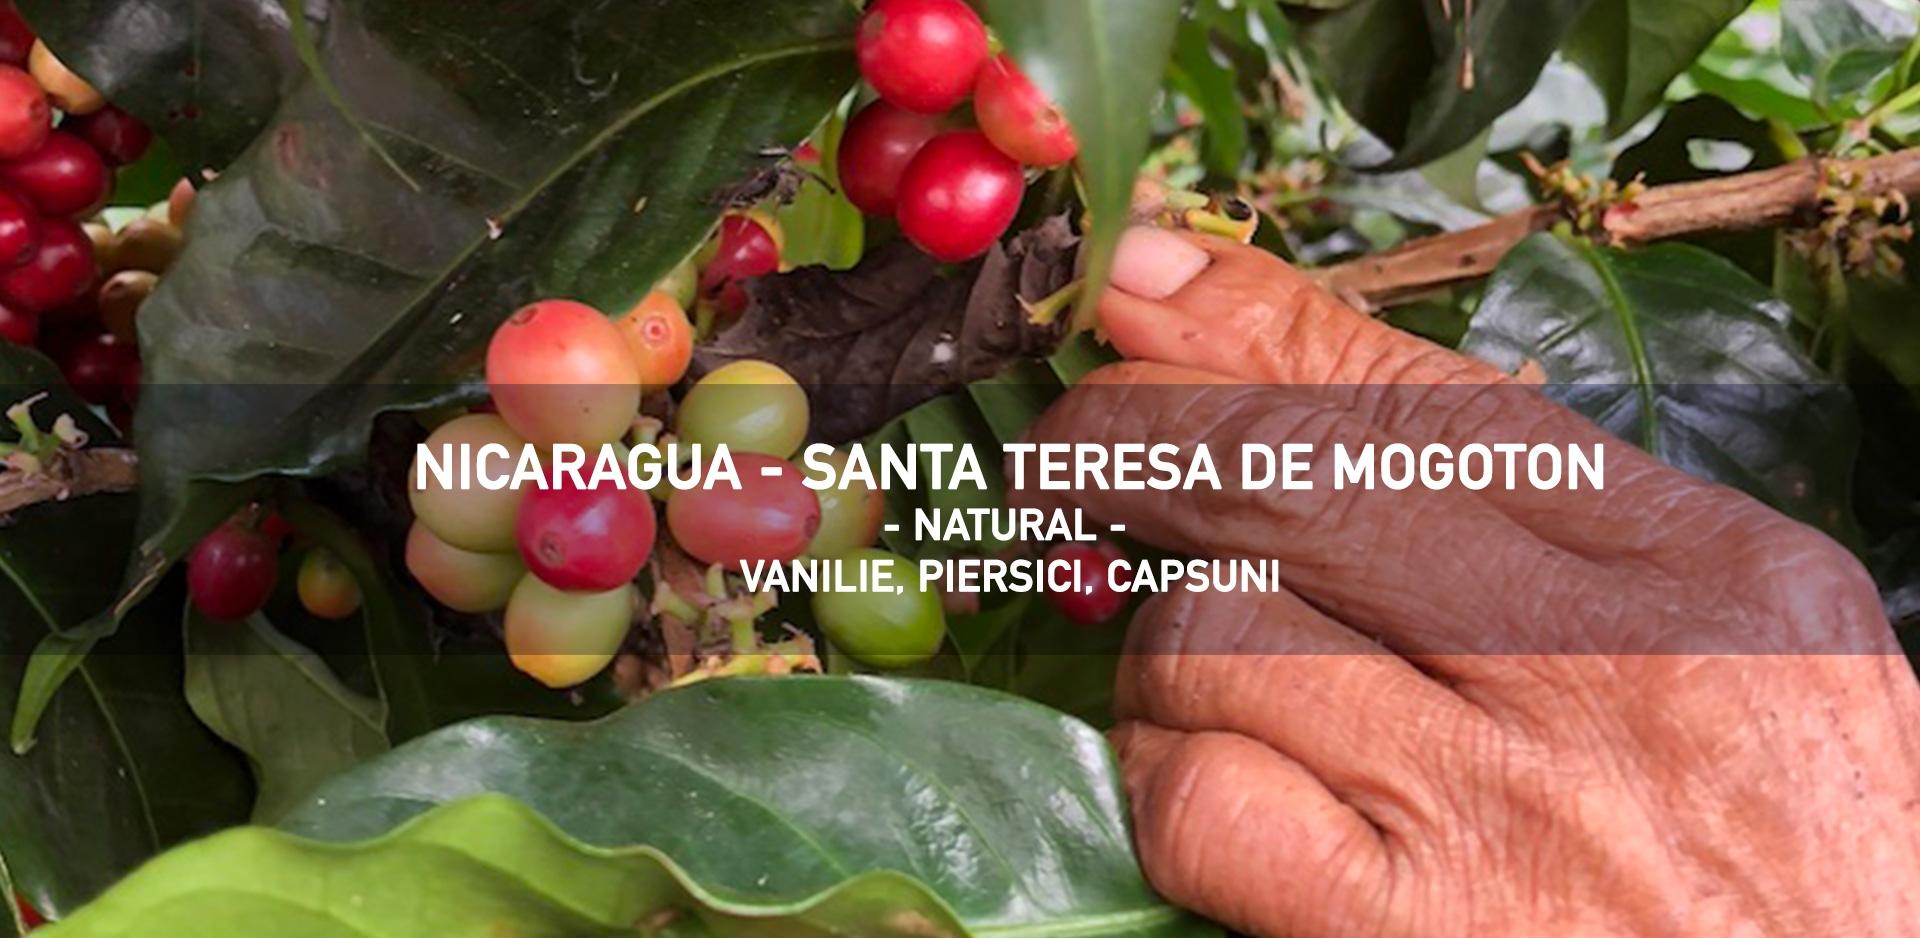 nicaragua-santa-teresa-de-mogoton